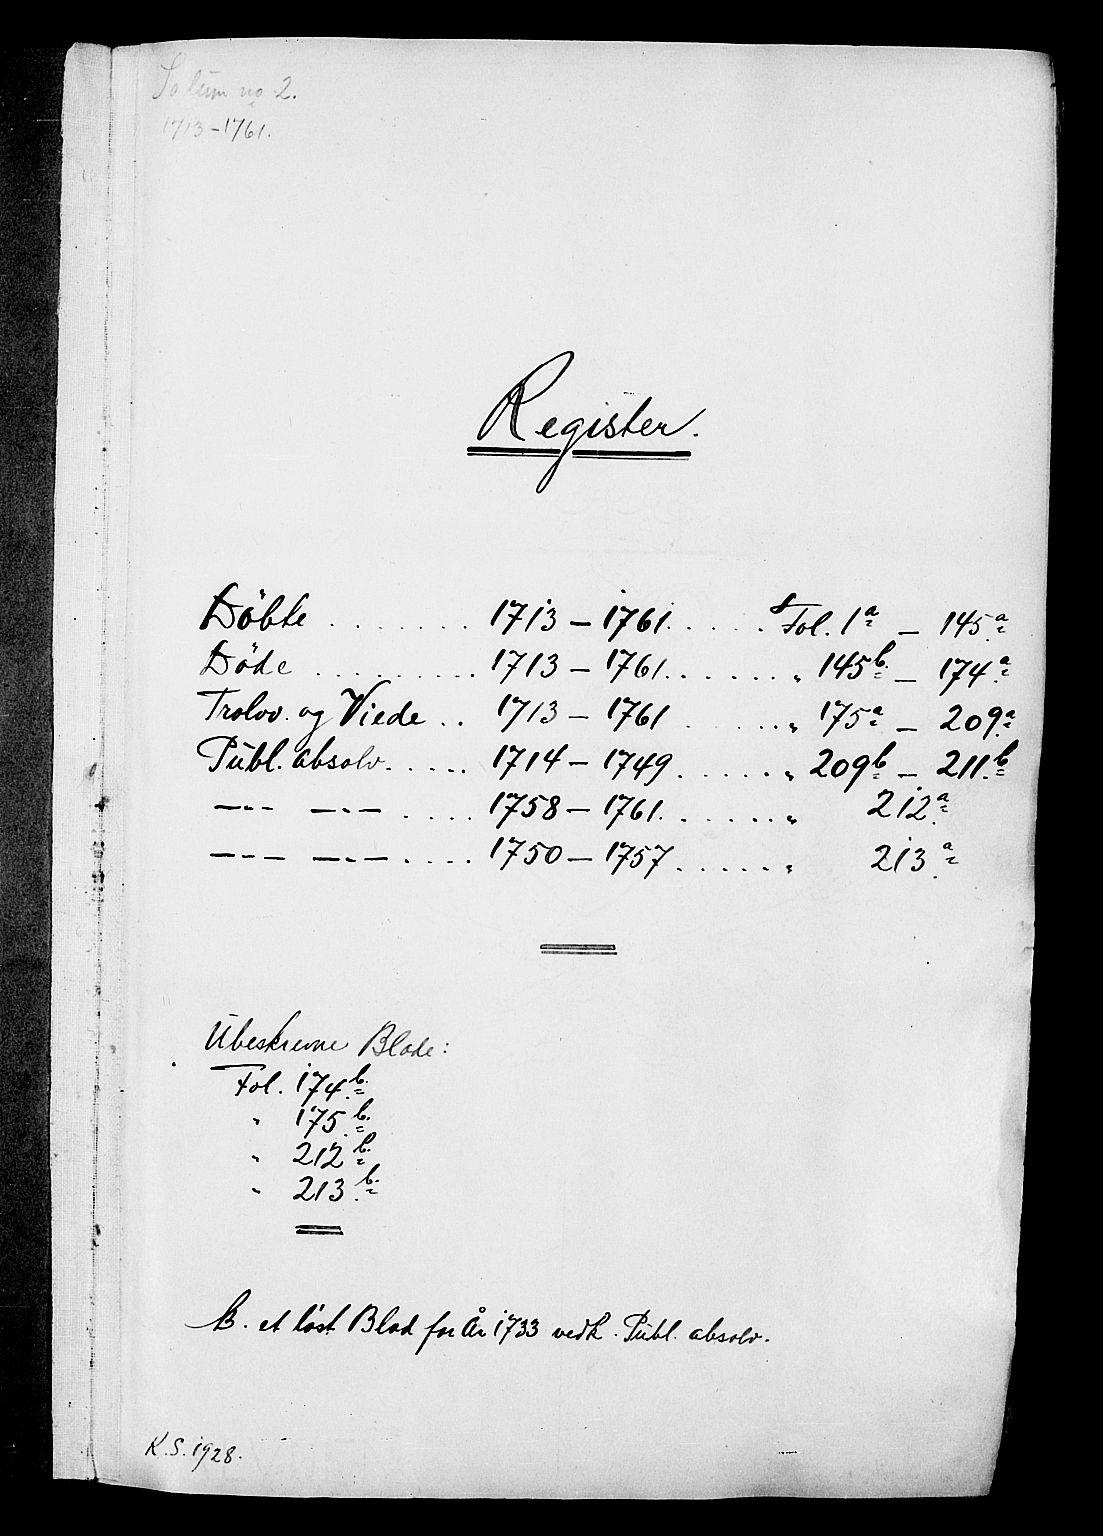 SAKO, Solum kirkebøker, F/Fa/L0002: Ministerialbok nr. I 2, 1713-1761